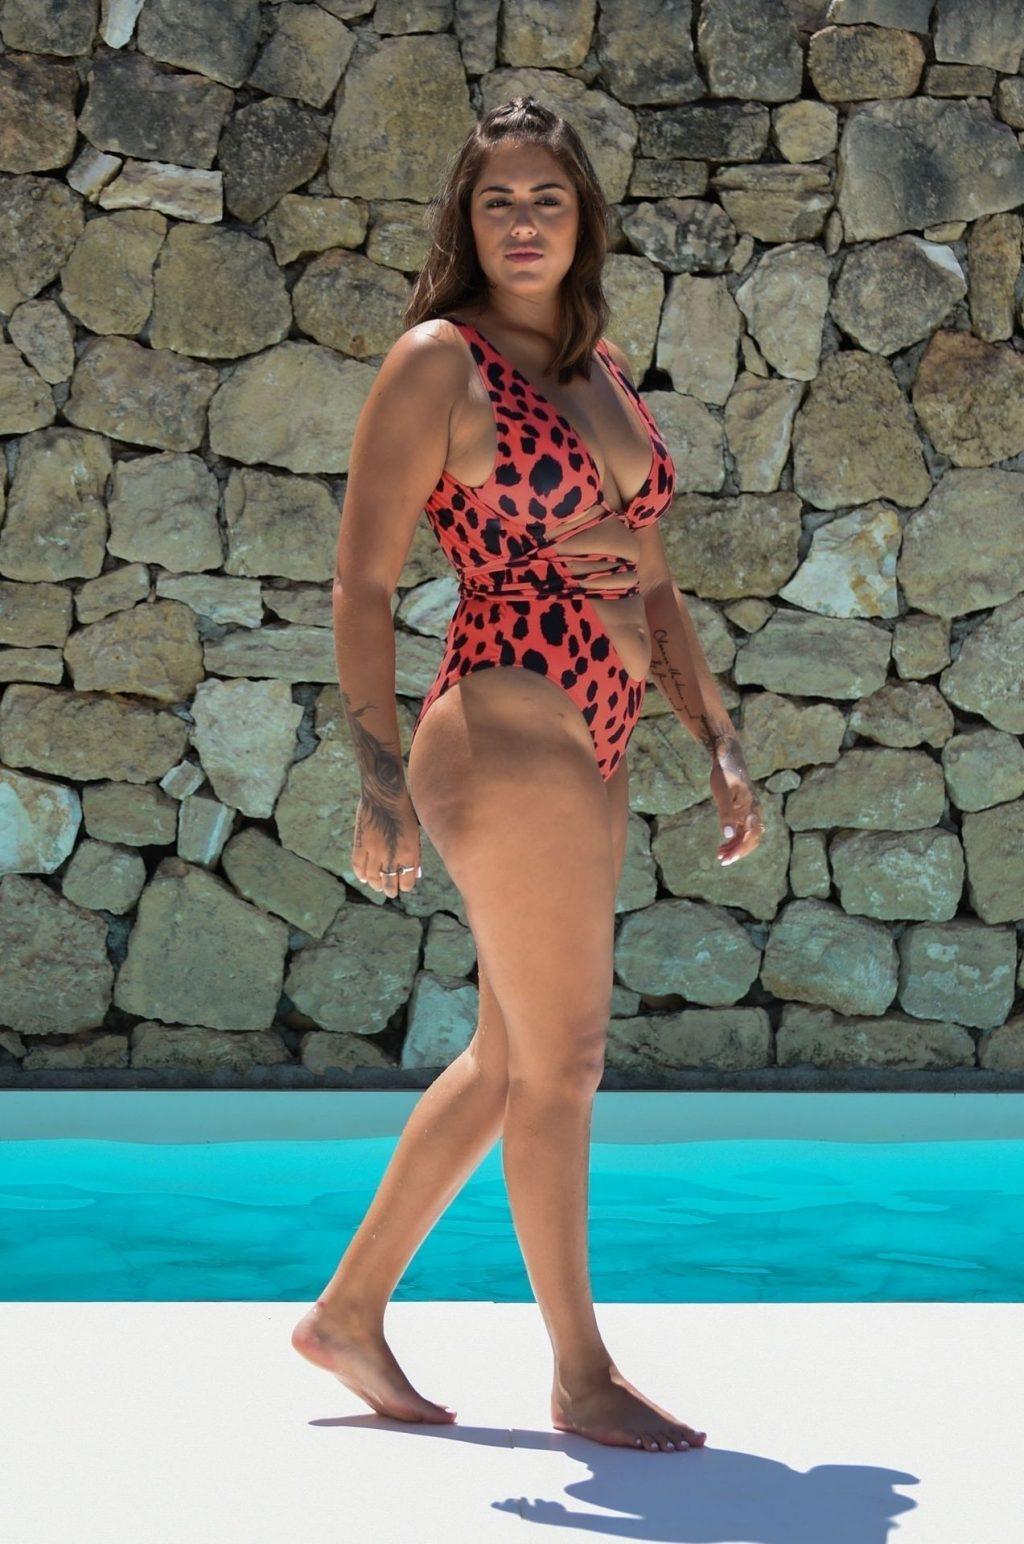 Malin Andersson 2019 : Malin Andersson – Bikini candids-10